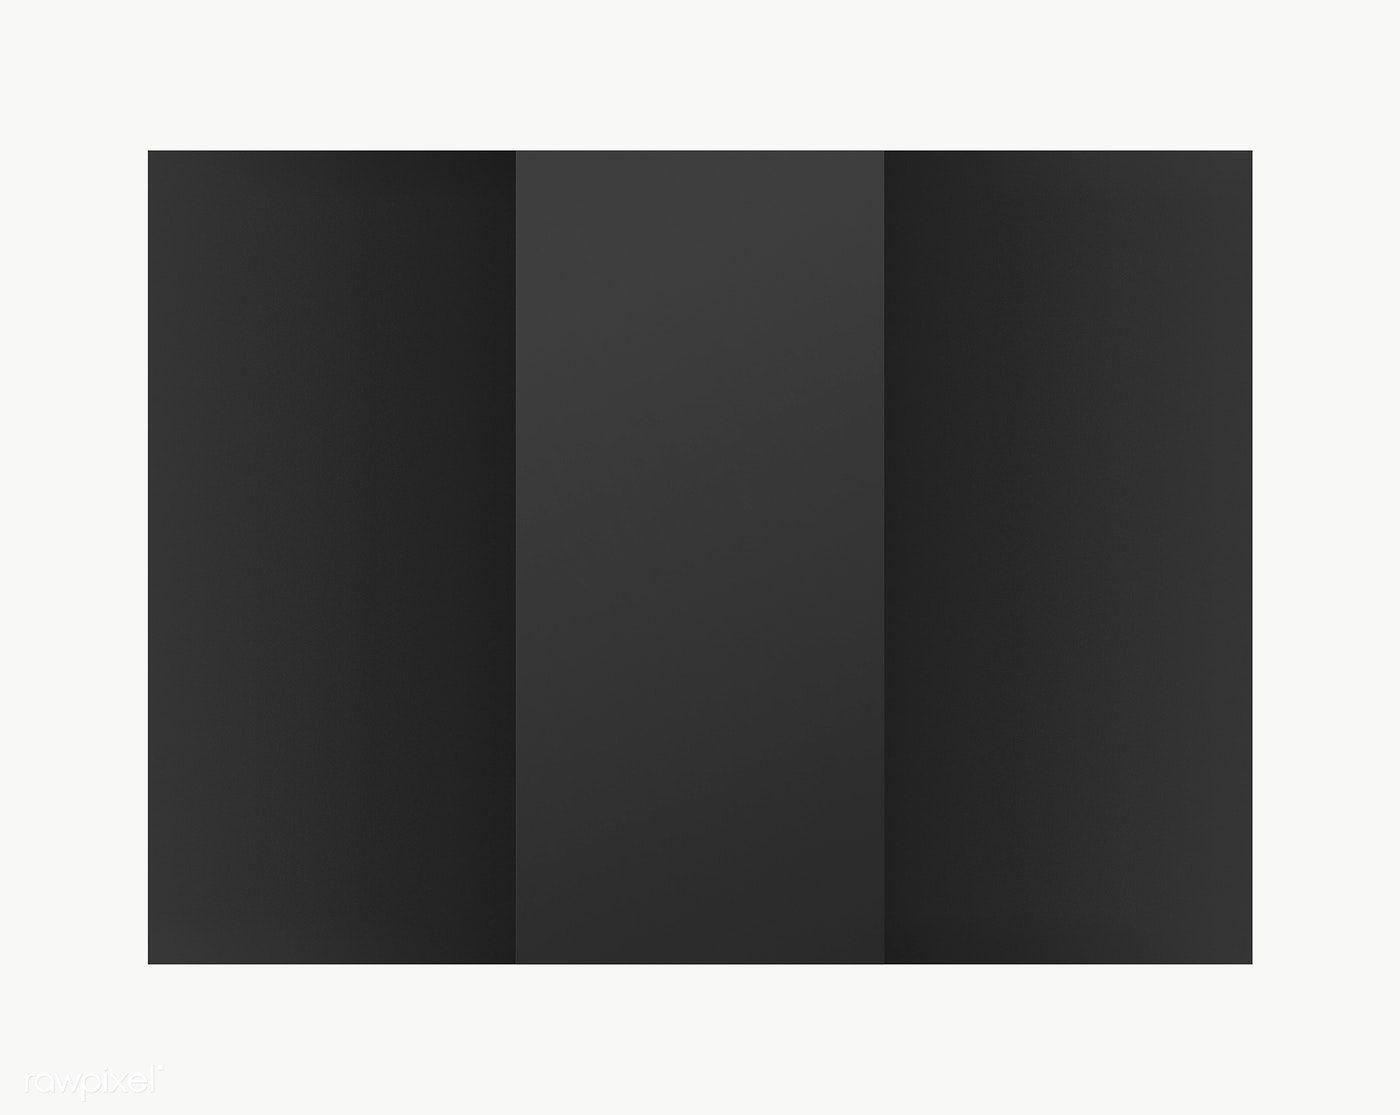 Download Premium Png Of Black Advertisement Brochure Transparent Png Free Brochure Design Business Card Design Simple Brochure Design Template